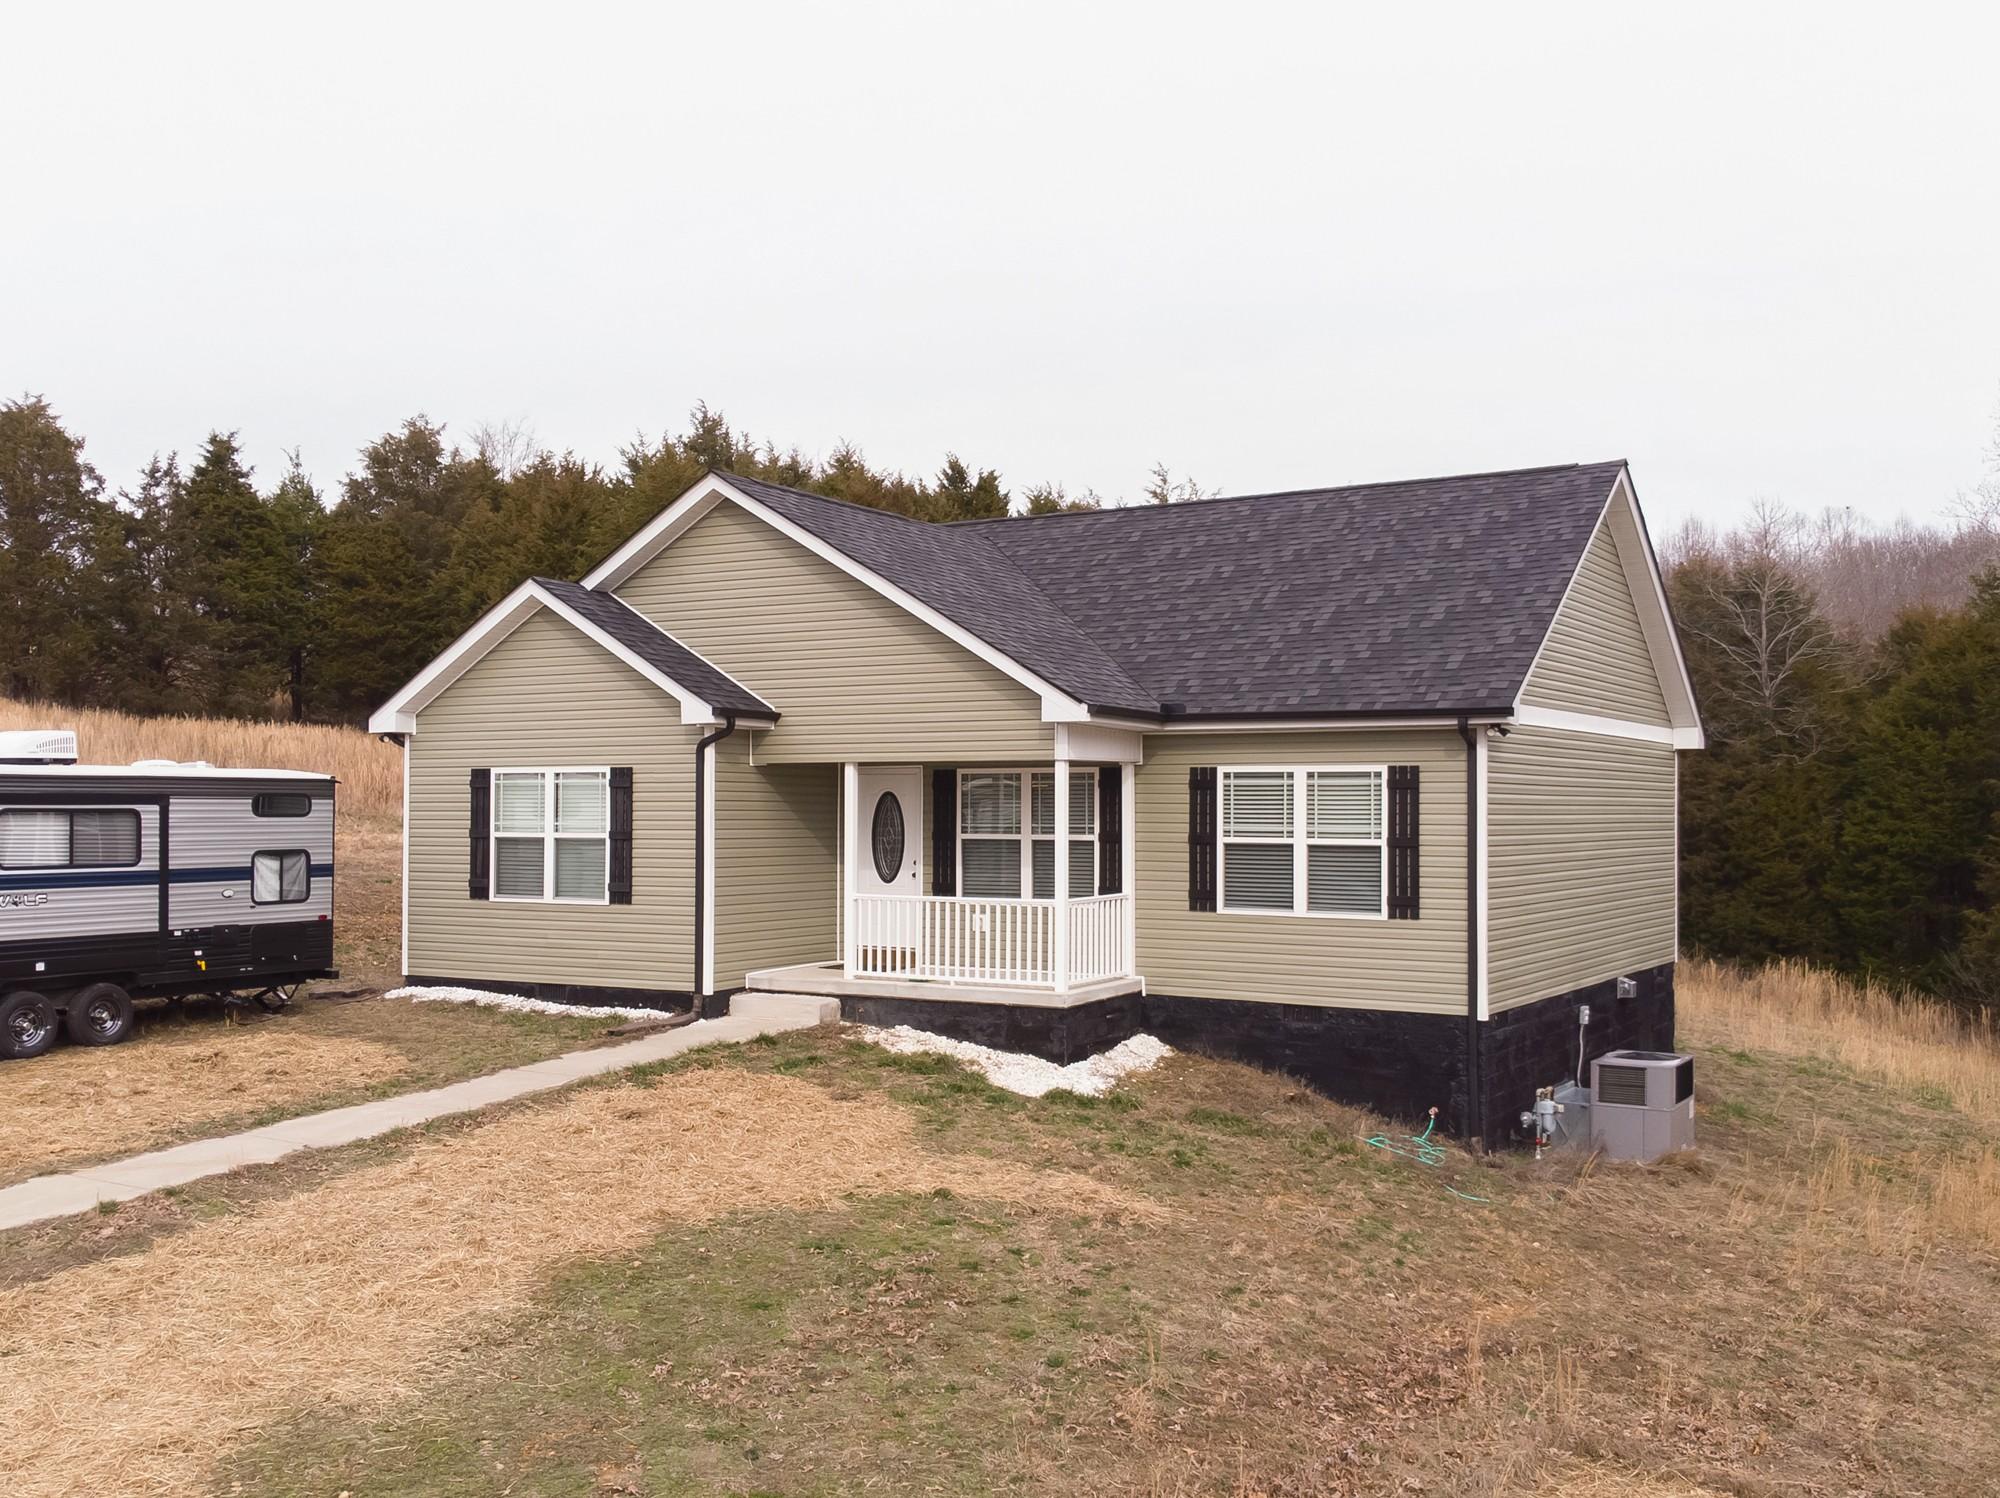 518 Matlock Rd, Charlotte, TN 37036 - Charlotte, TN real estate listing